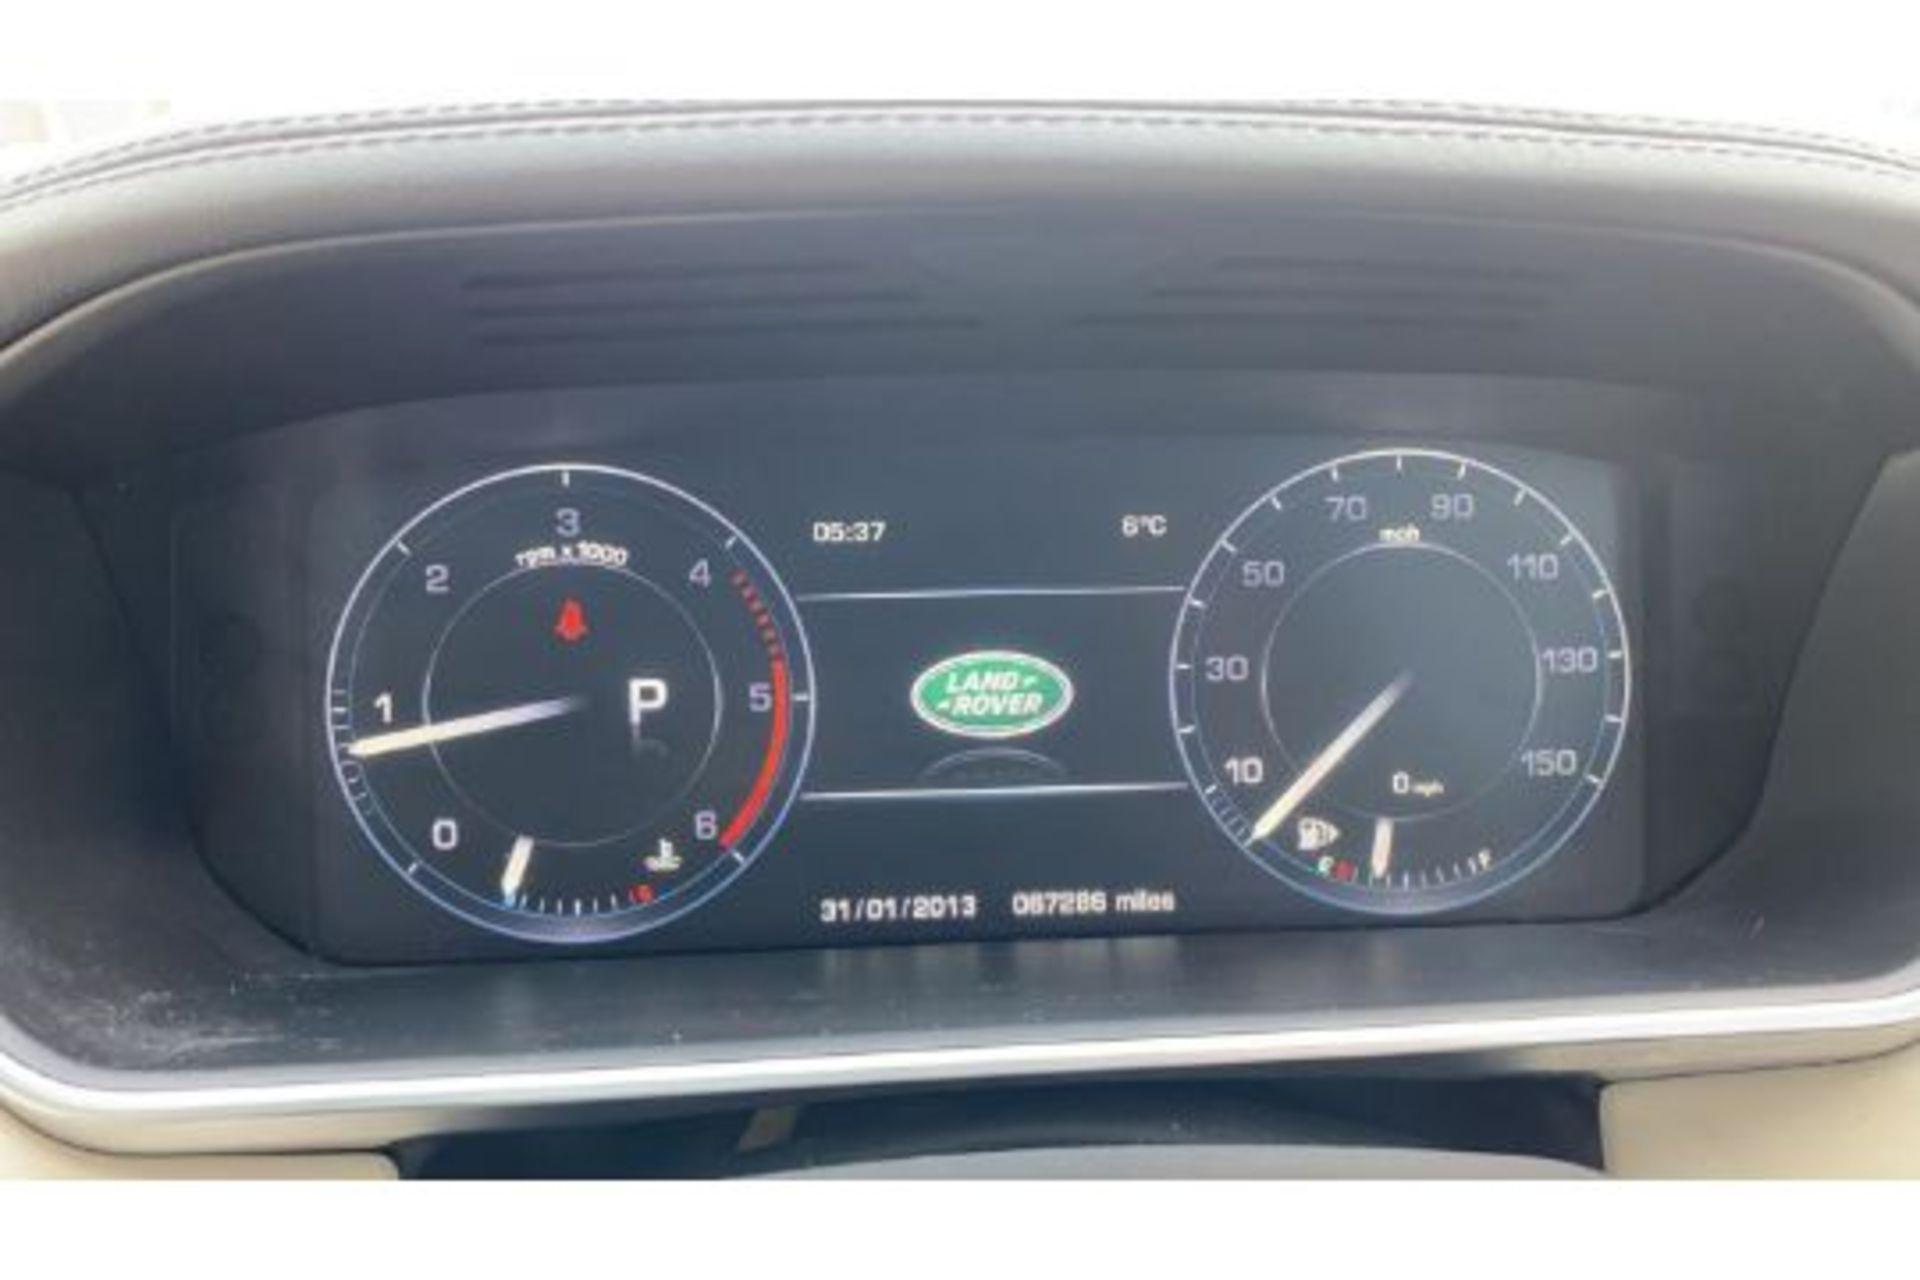 Range Rover Vogue 3.0 TDV6 SE Auto - Black Pack - NEW SHAPE - FULLY LOADED - Pan Roof - Image 30 of 30